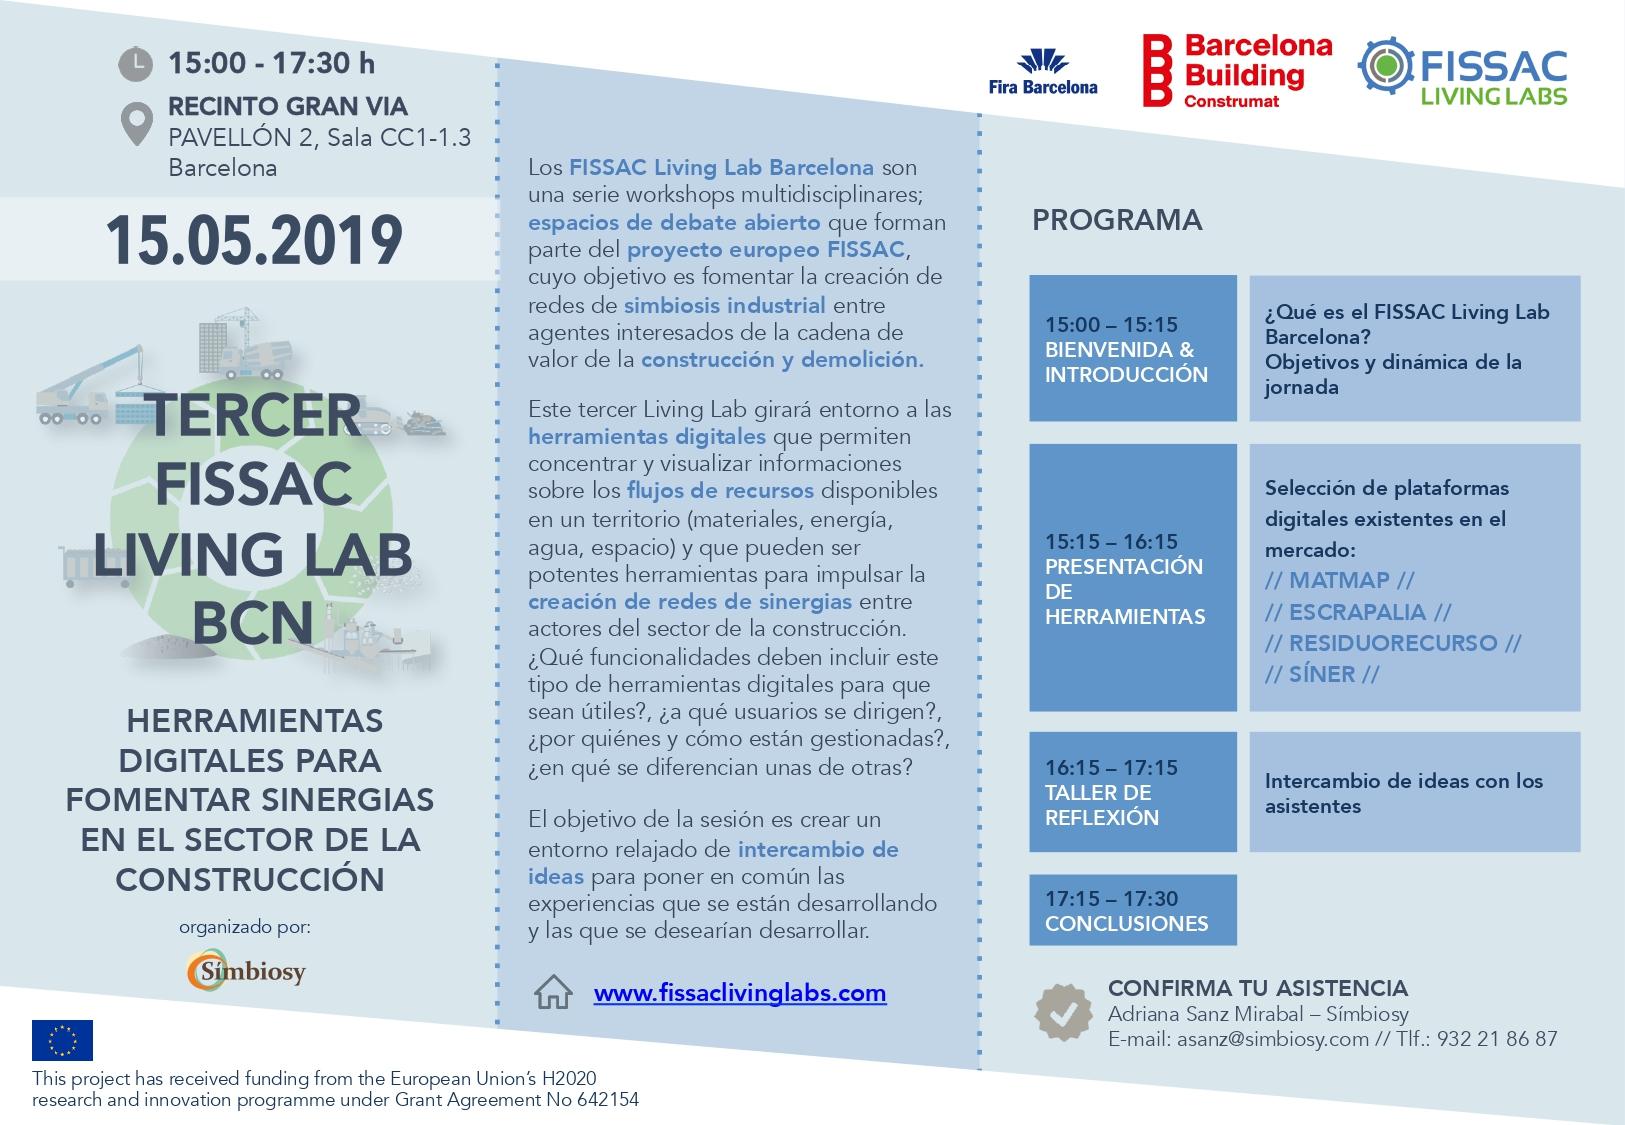 FISSAC Living Lab Barcelona III